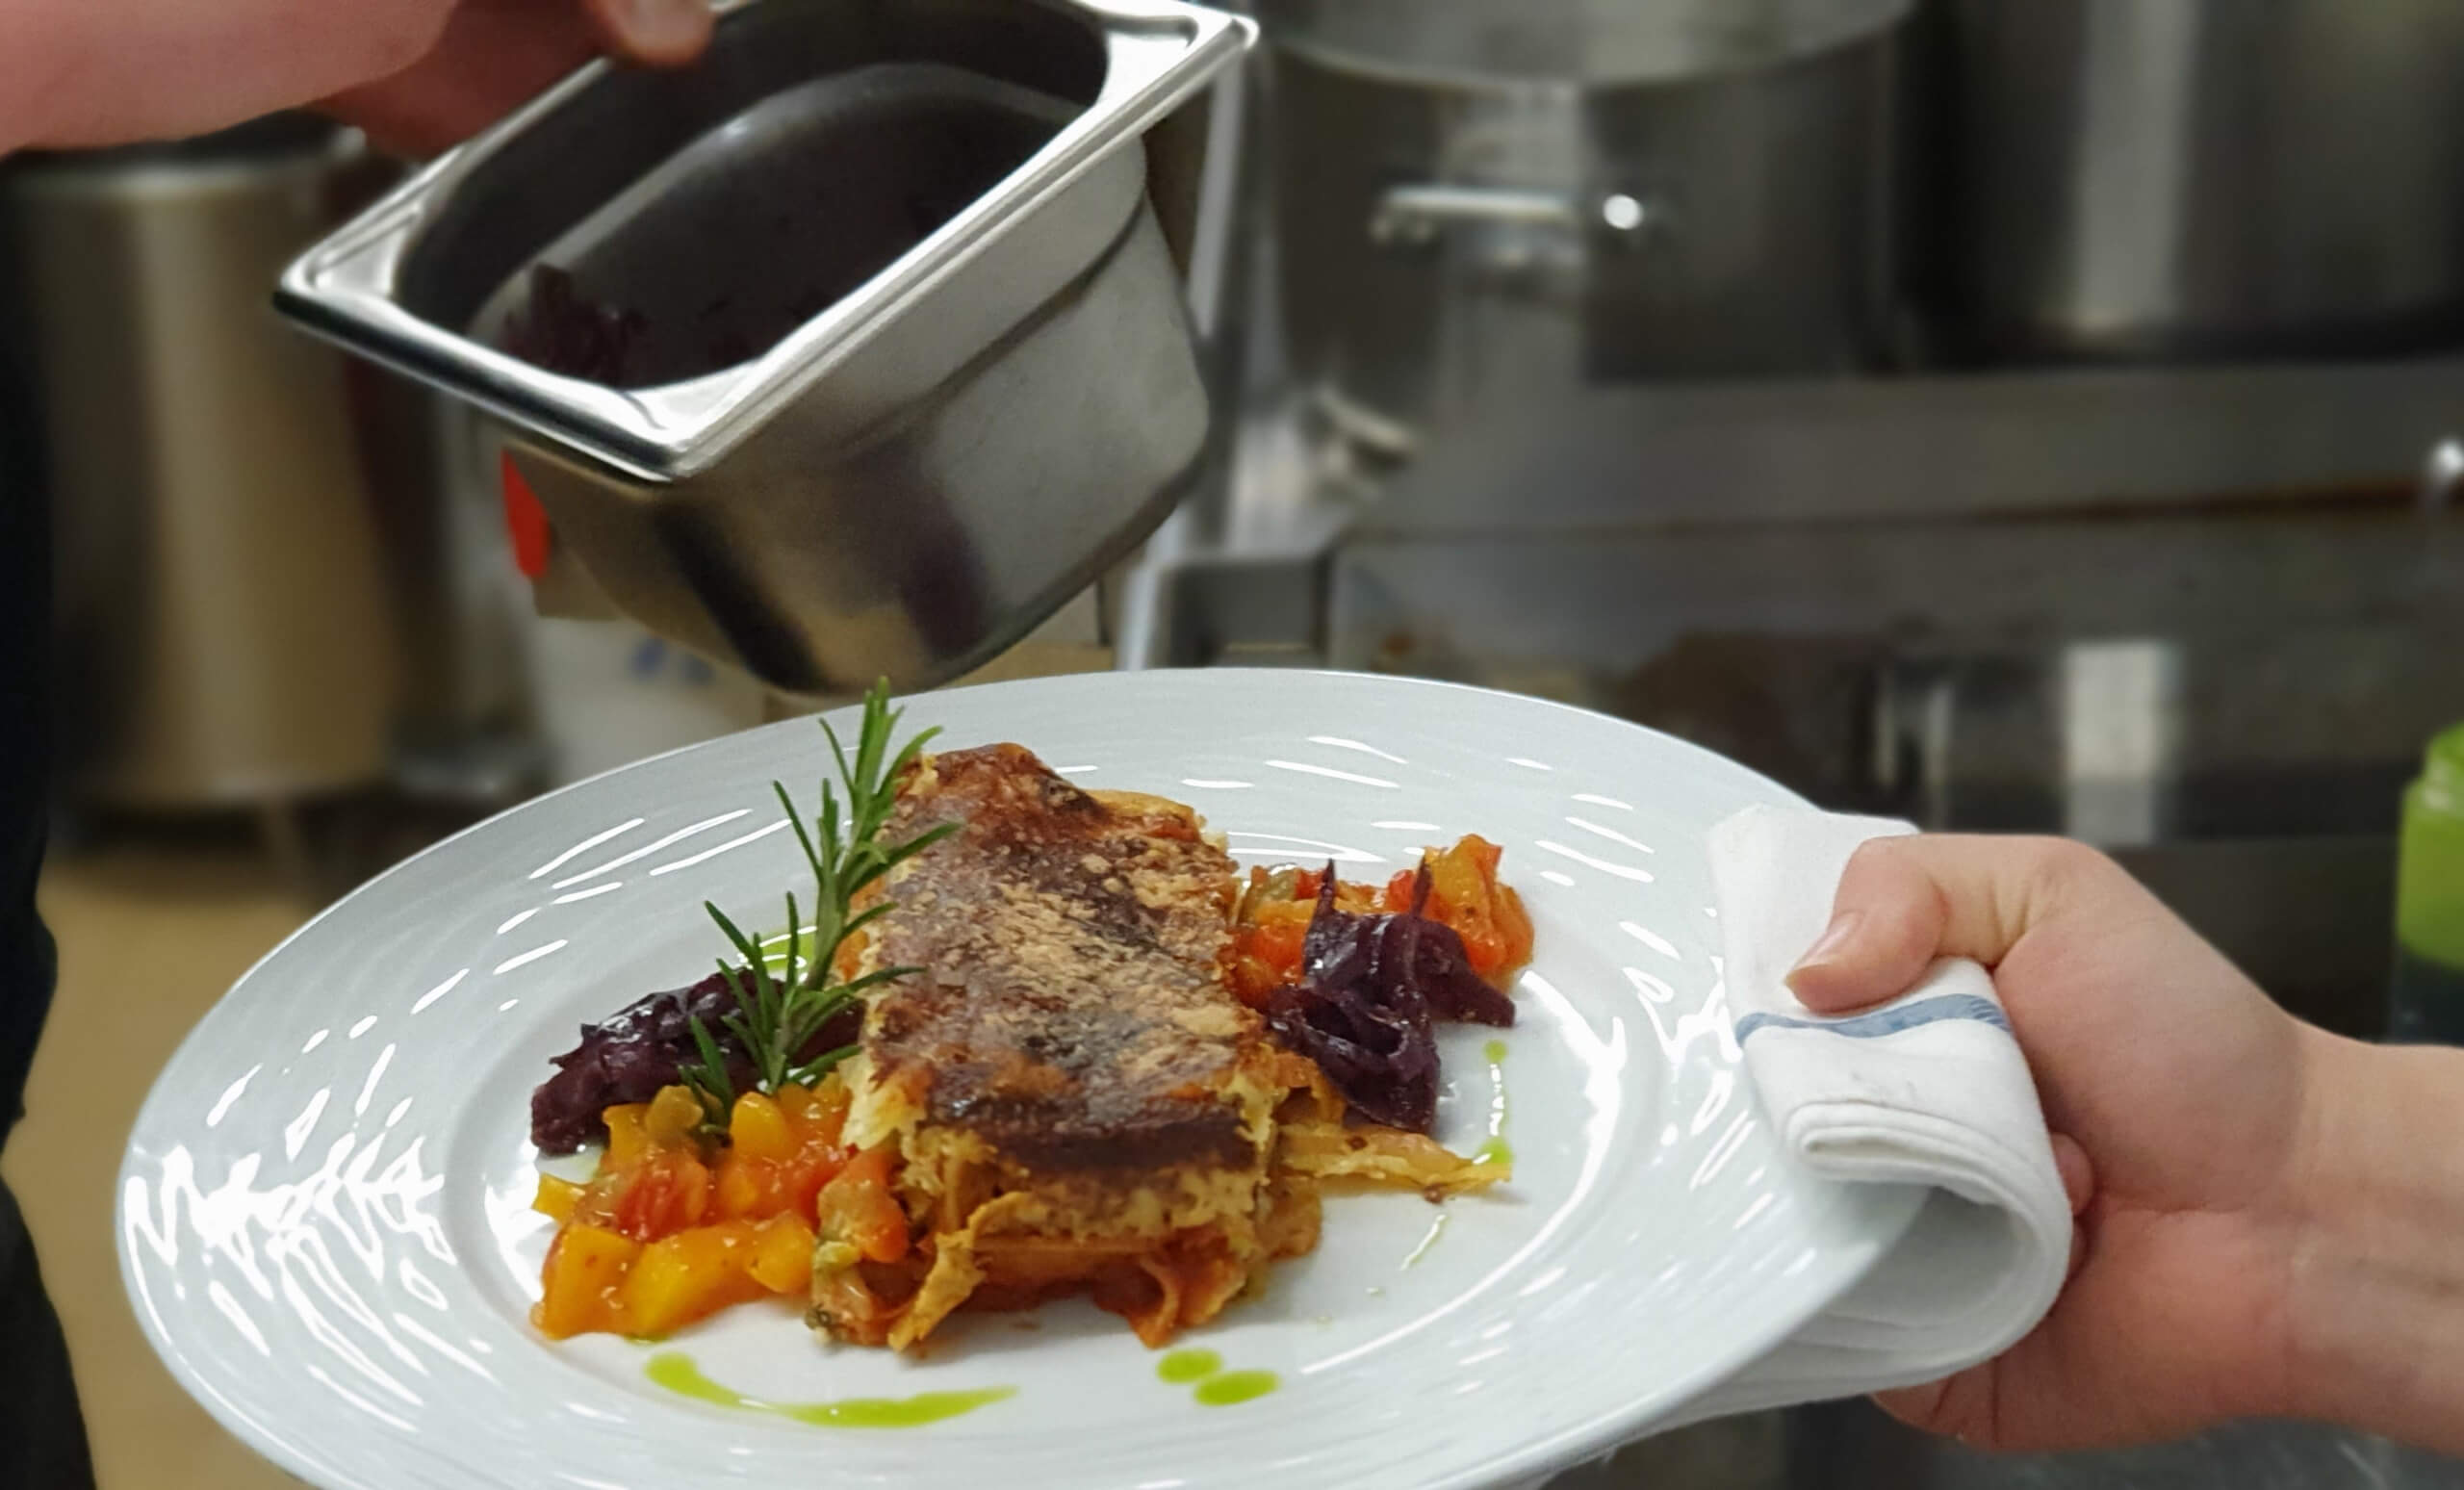 hotel-cafe-restaurant-rosengaertli-leissigen-gericht-kueche